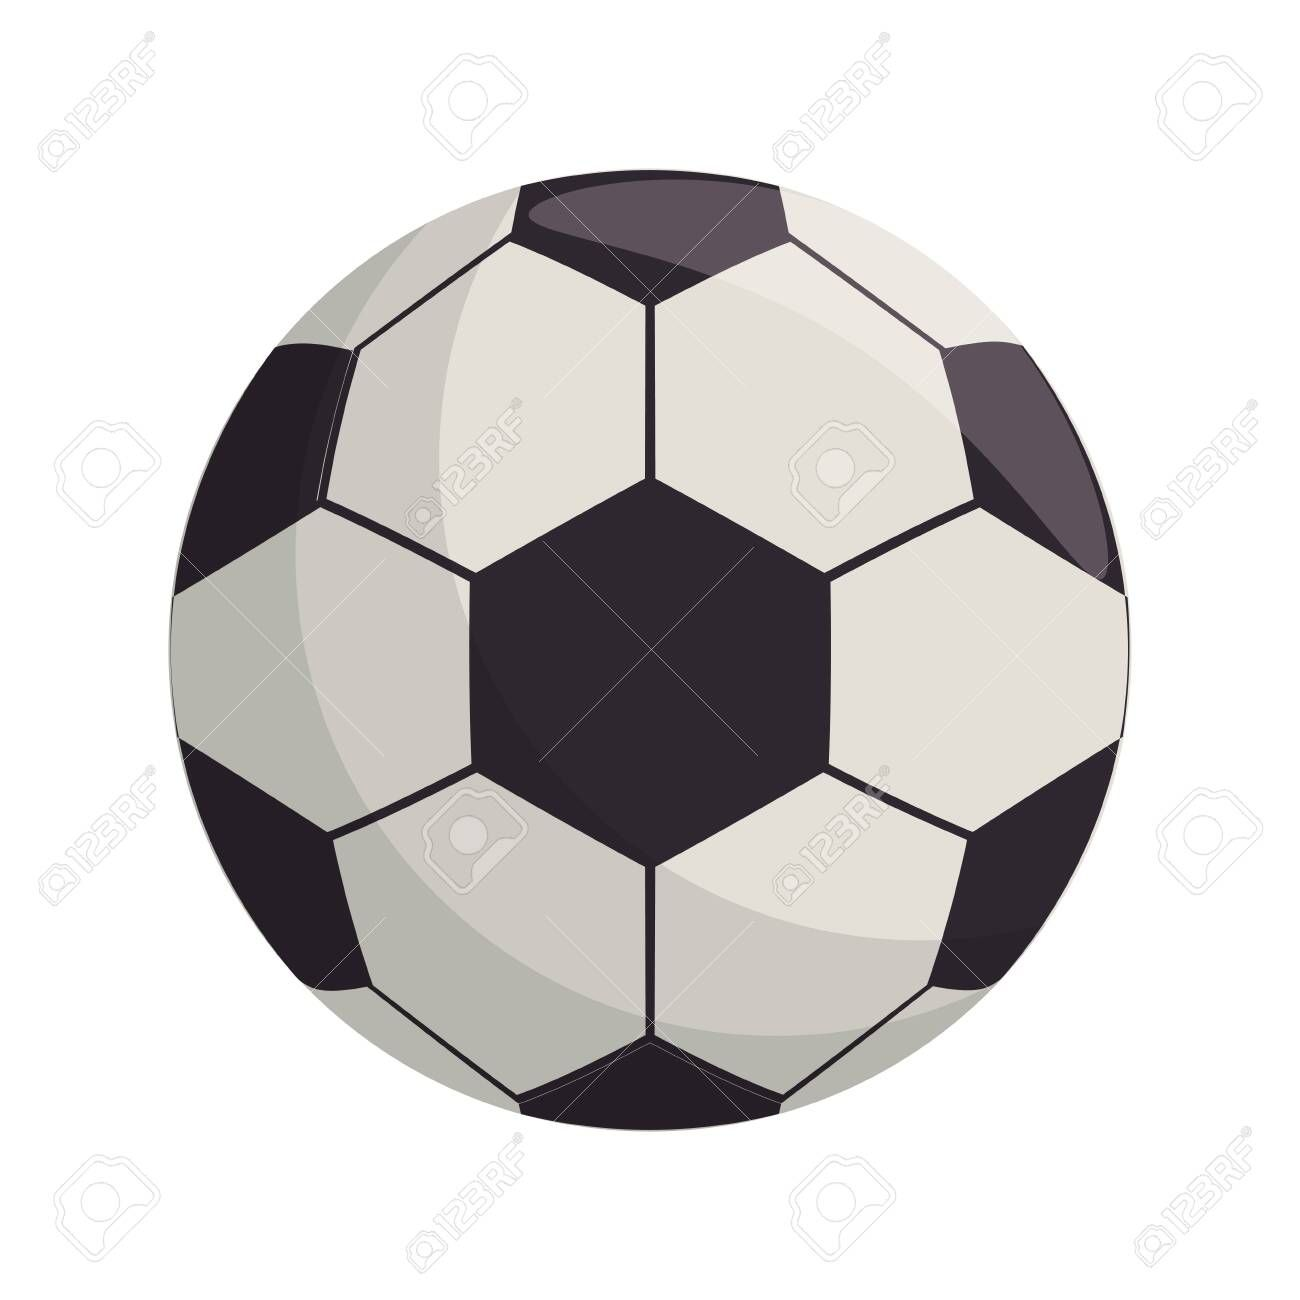 Soccer Football Ball Equipment Cartoon Isolated Vector Illustration Graphic Design Sponsored Equipment Cartoon Ball Football Ball Soccer Soccer Ball